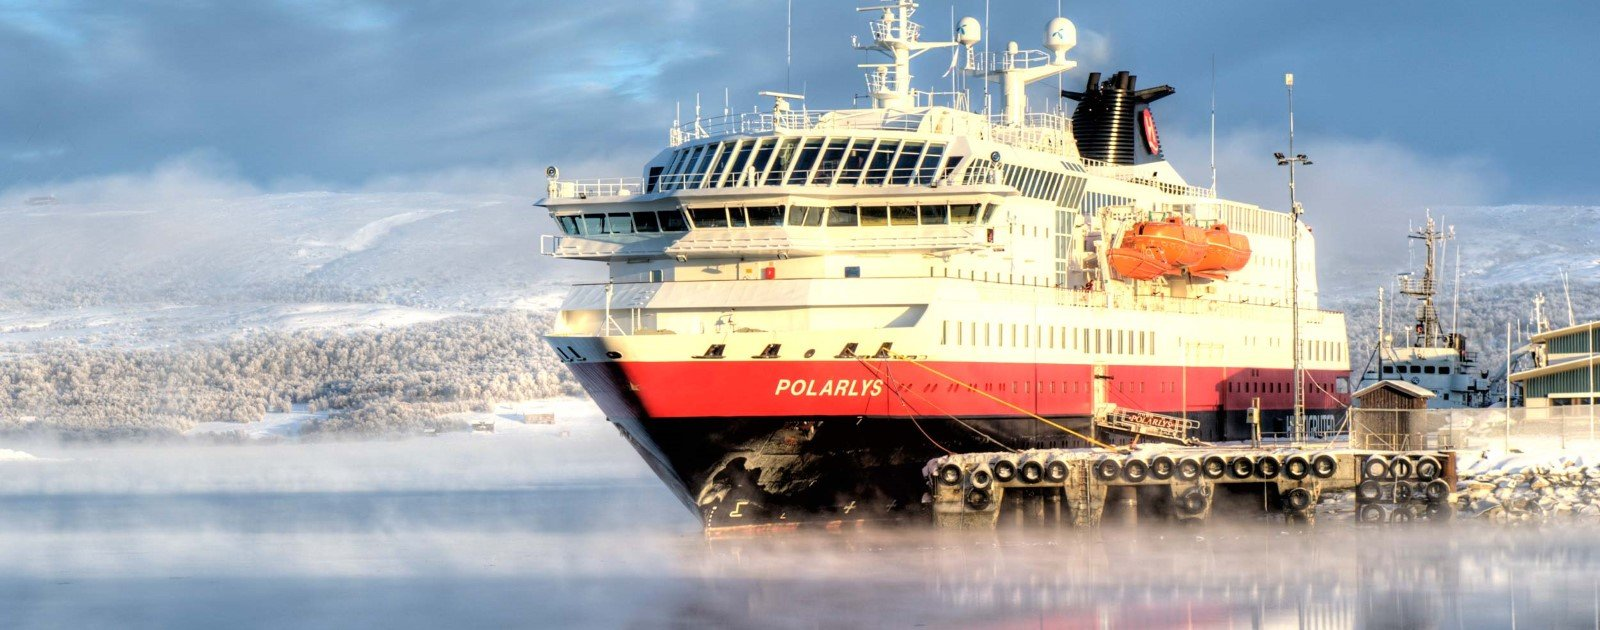 MS Polarlys | Hurtigruten